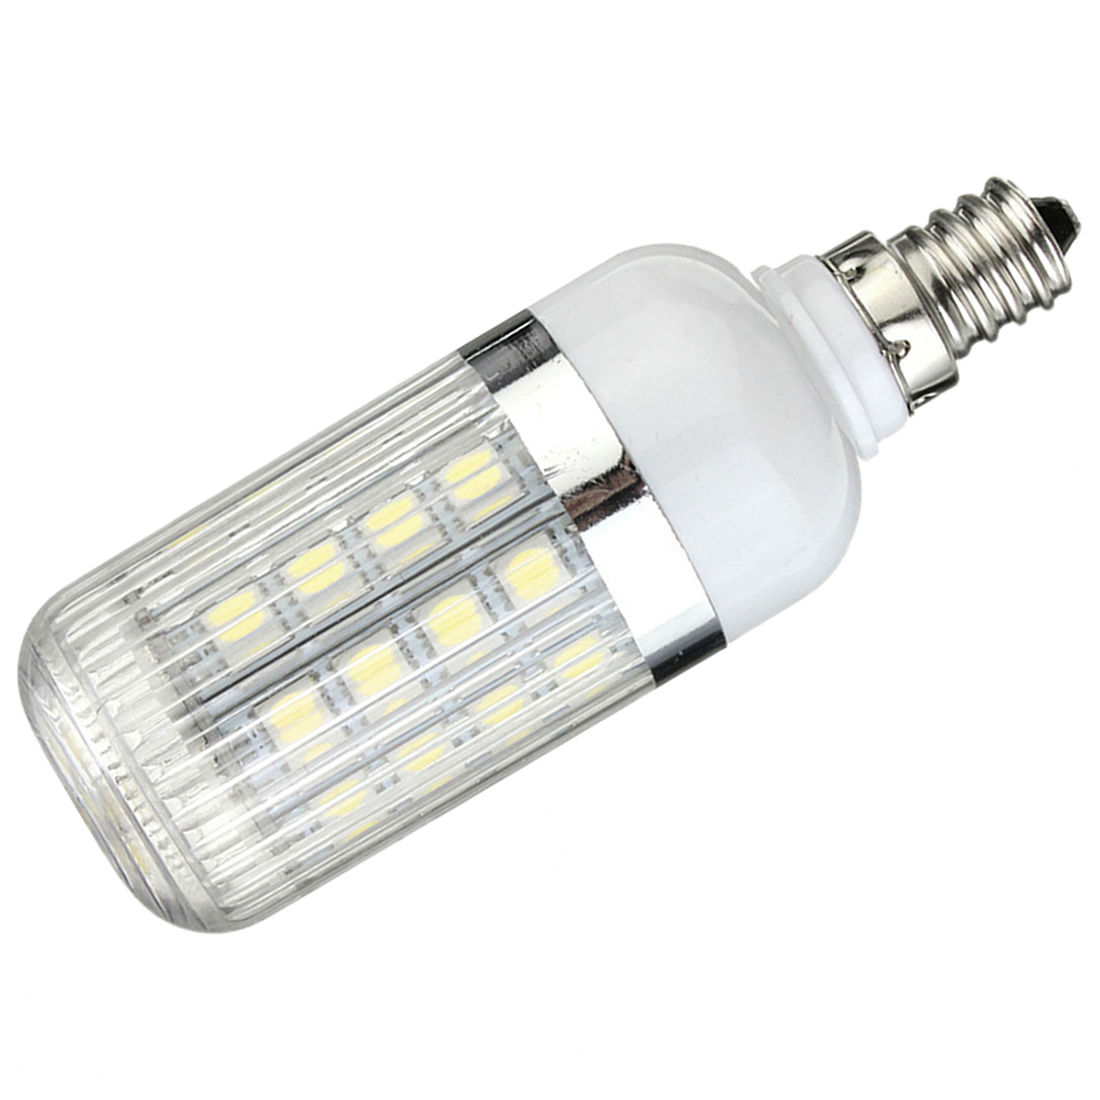 E12 5W Dimmable 36 SMD 5050 LED Corn Light Bulb Lamp Color Temperature:Pure White(6000-6500K) Amount:8 Pcs new corn bulb e27 9 11 12 14w 220v pure warm white smd 5050 44 52 60 64 led spot light bulb lamp flat tube